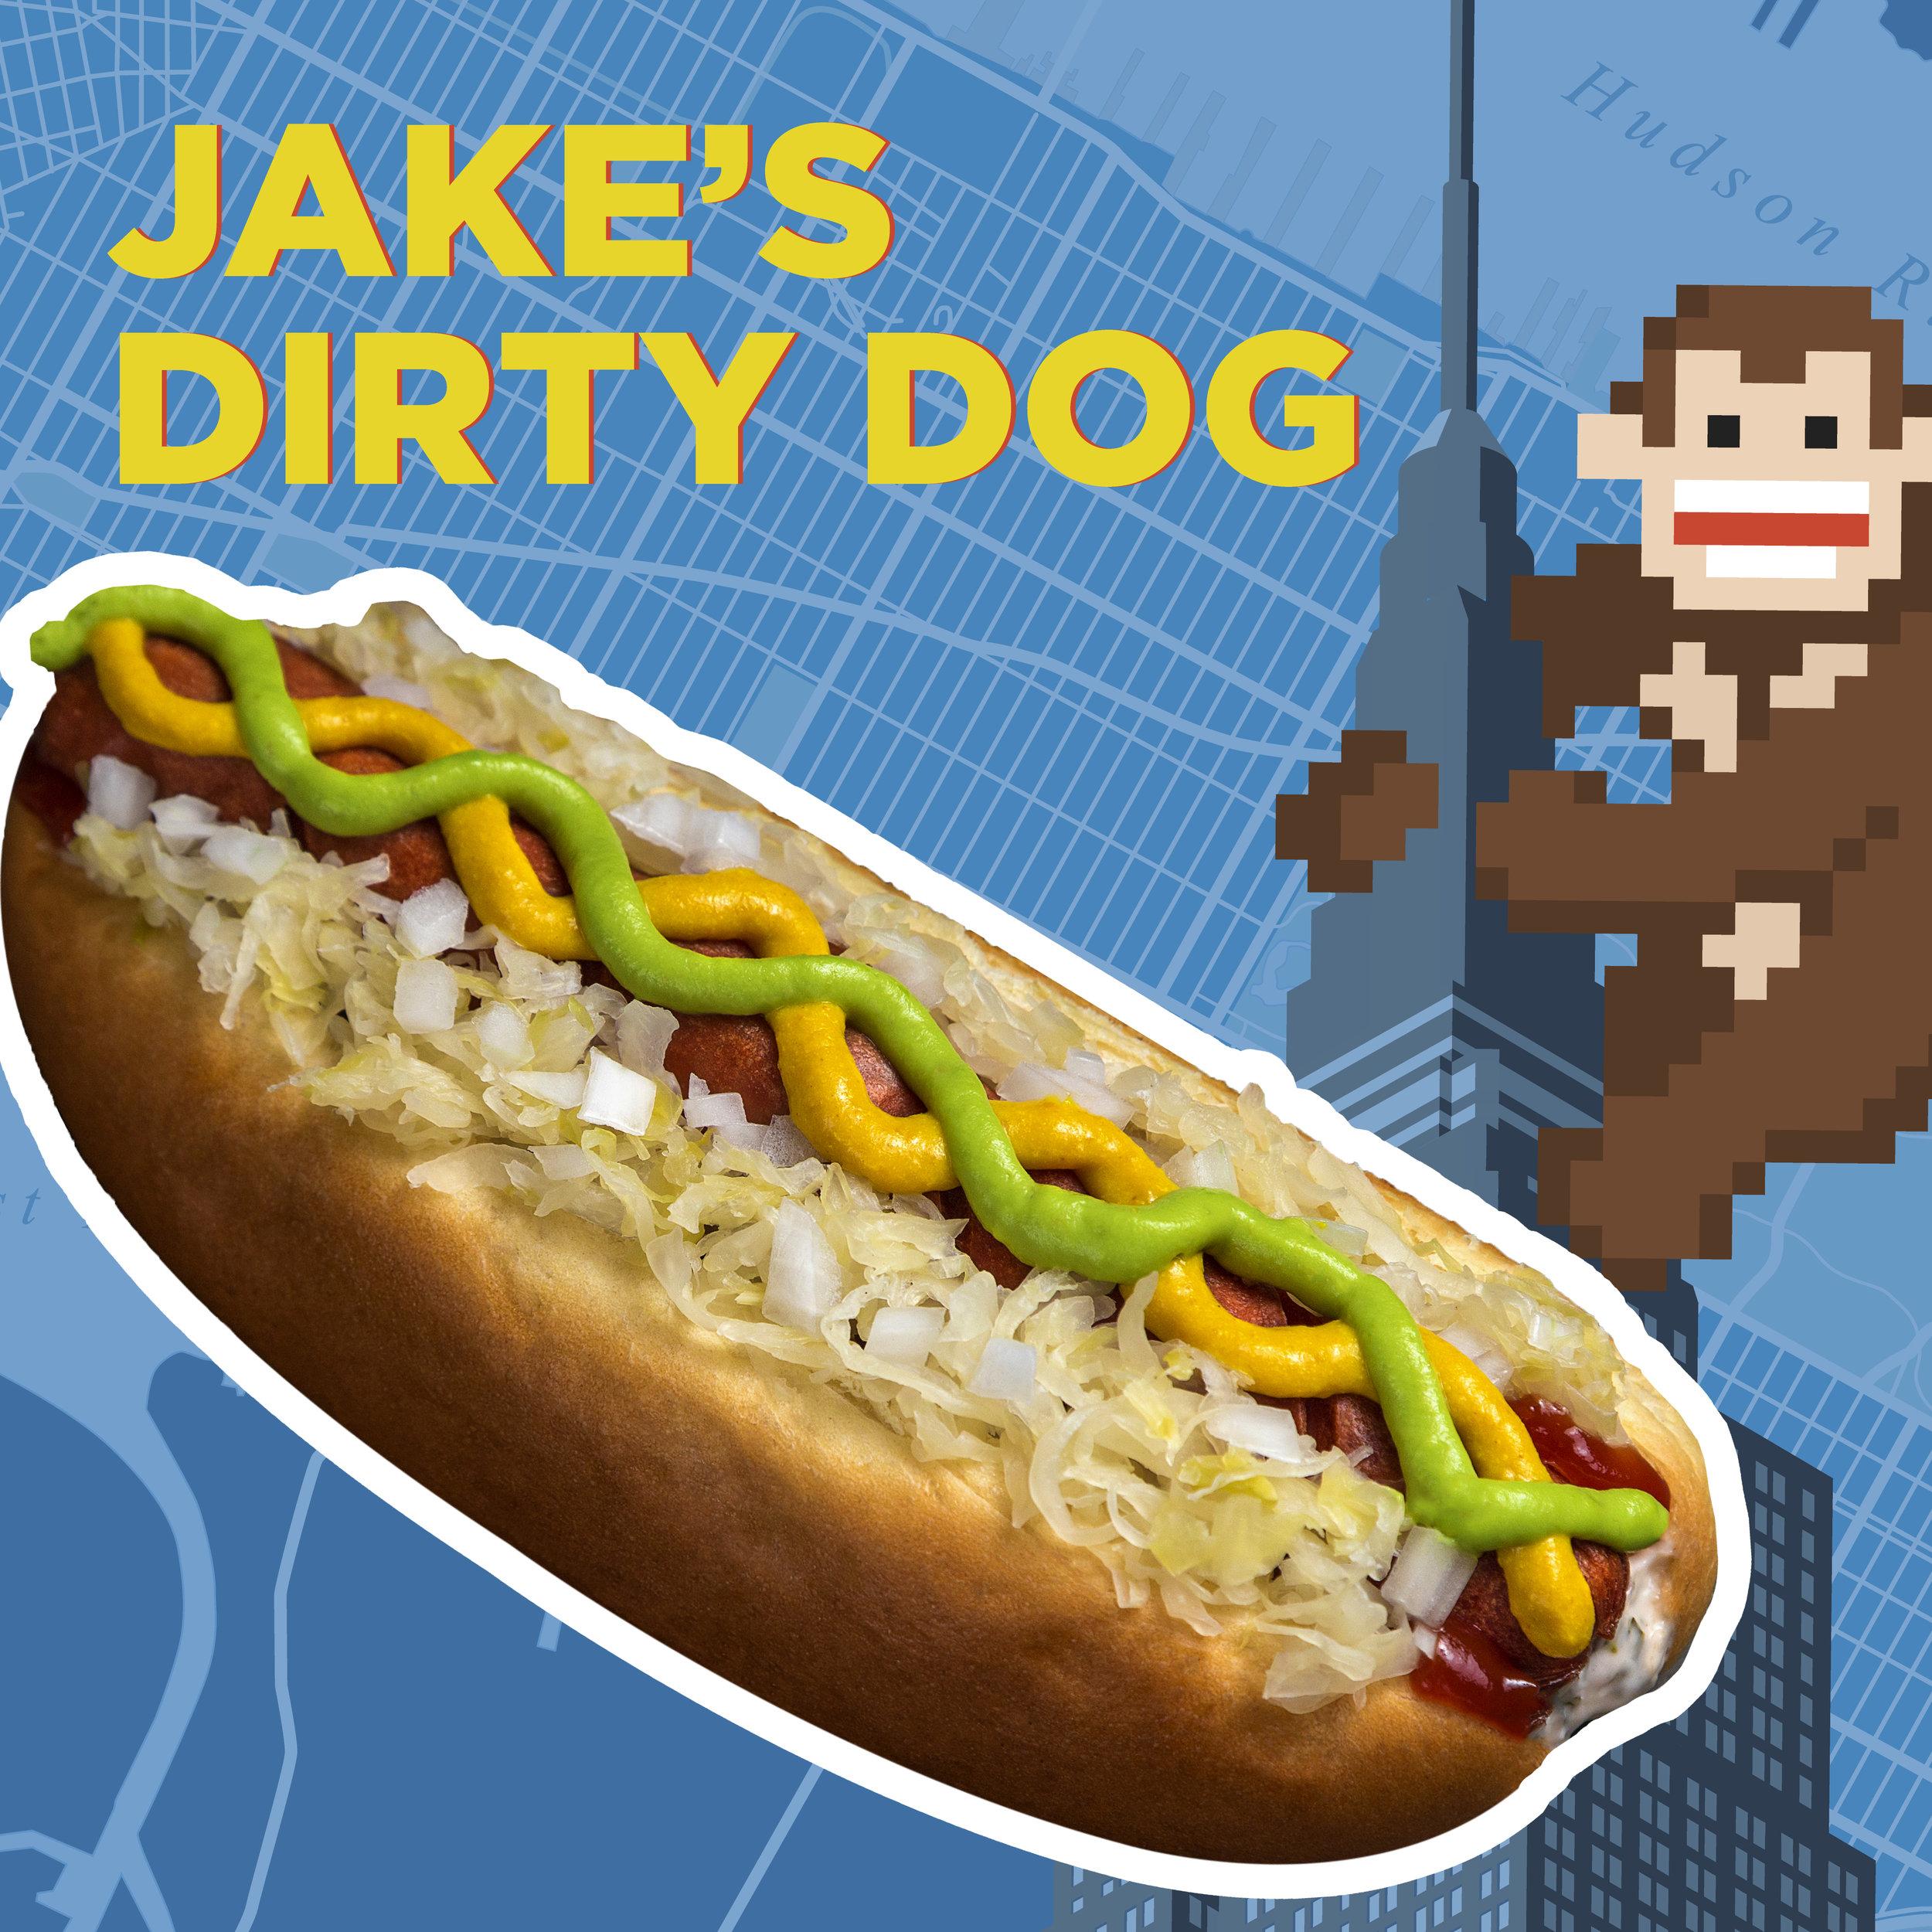 Dirty Dog 1.jpg